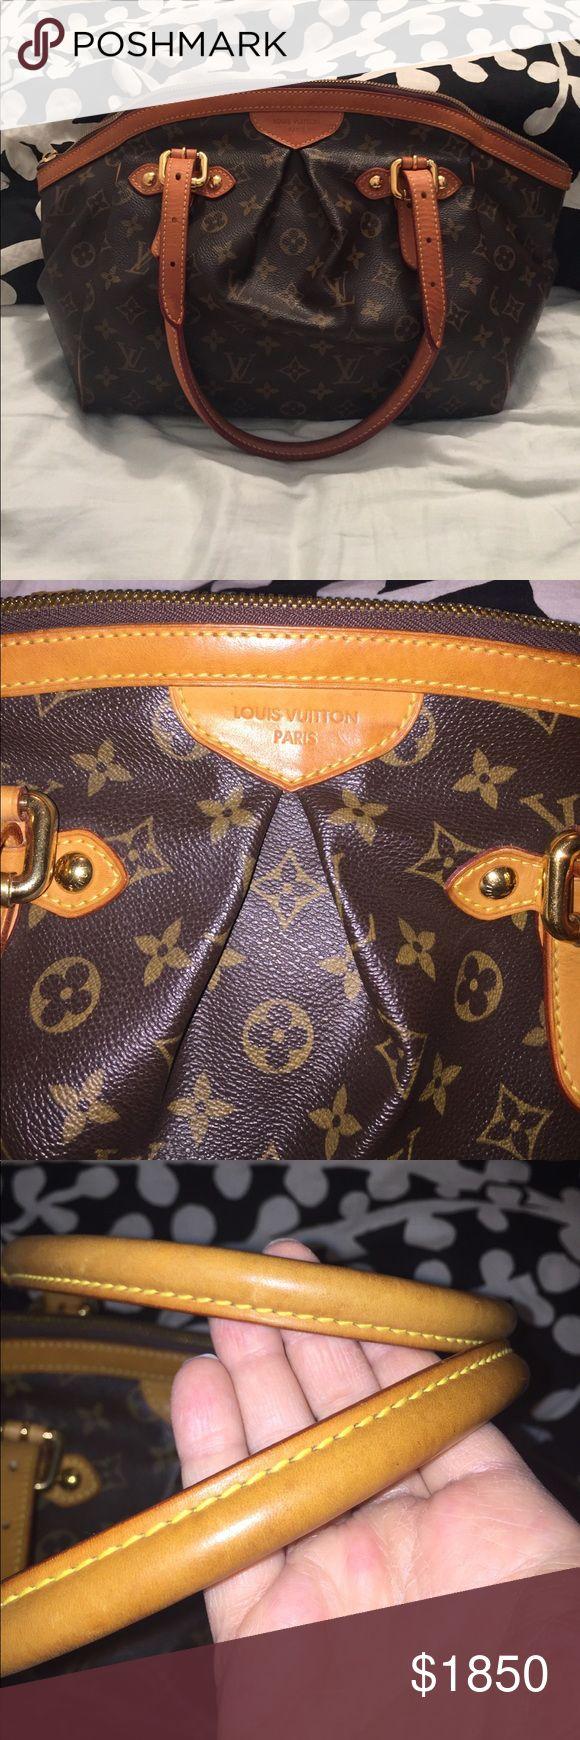 ❤️LOUIS VUITTON TIVOLI GM❤️ XTRA pictures of GM Tivoli Louis Vuitton Bags